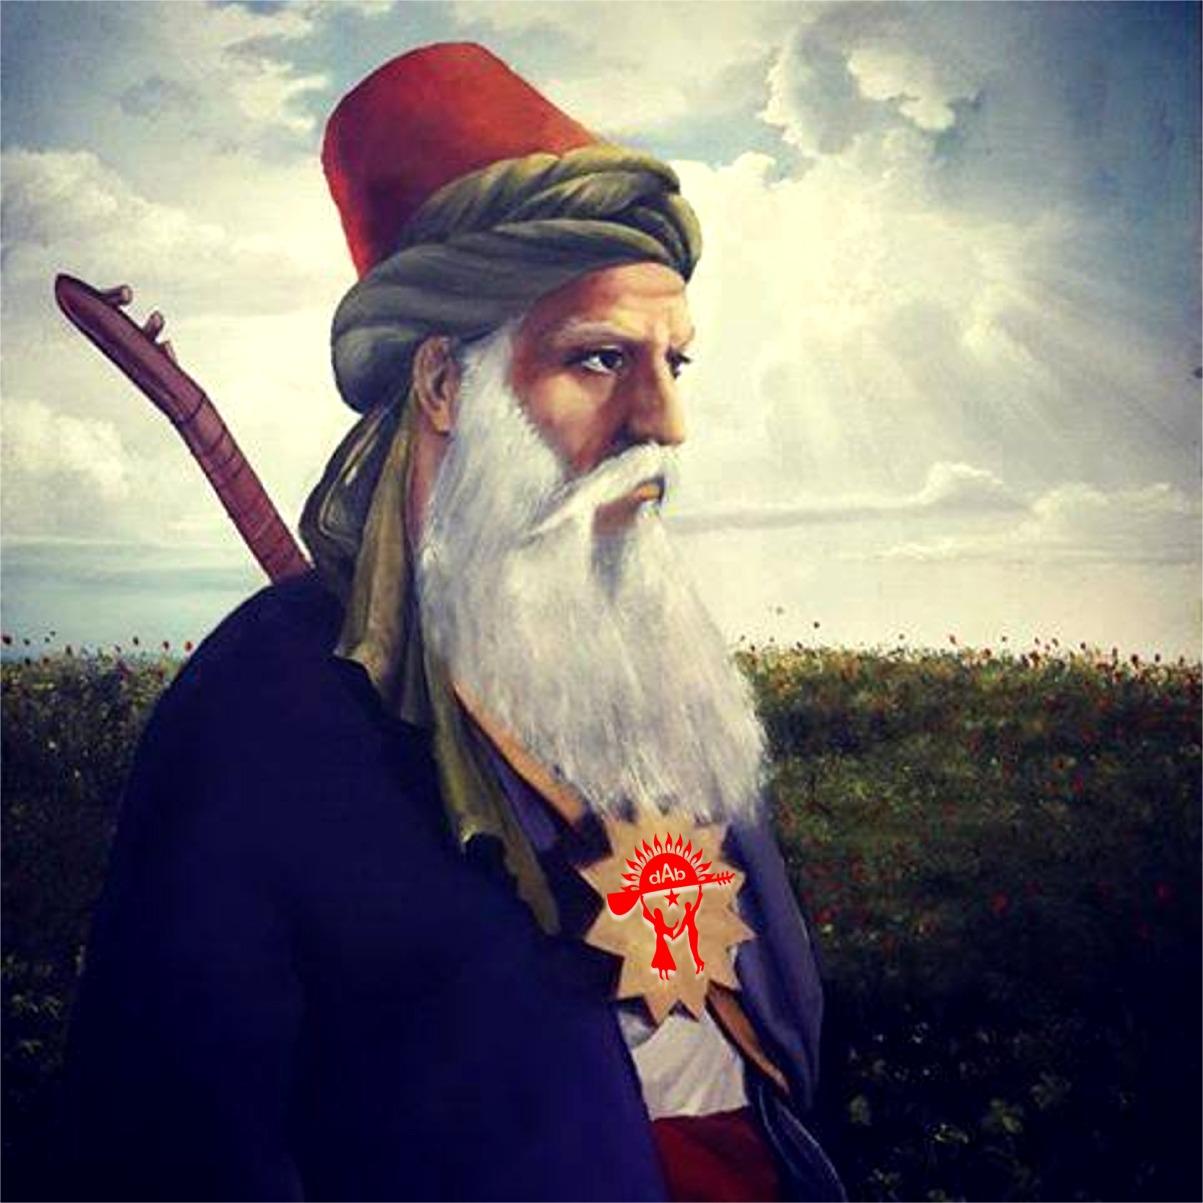 Pir sultan yeni Devrimci Alevi Kızılbas pir sultan